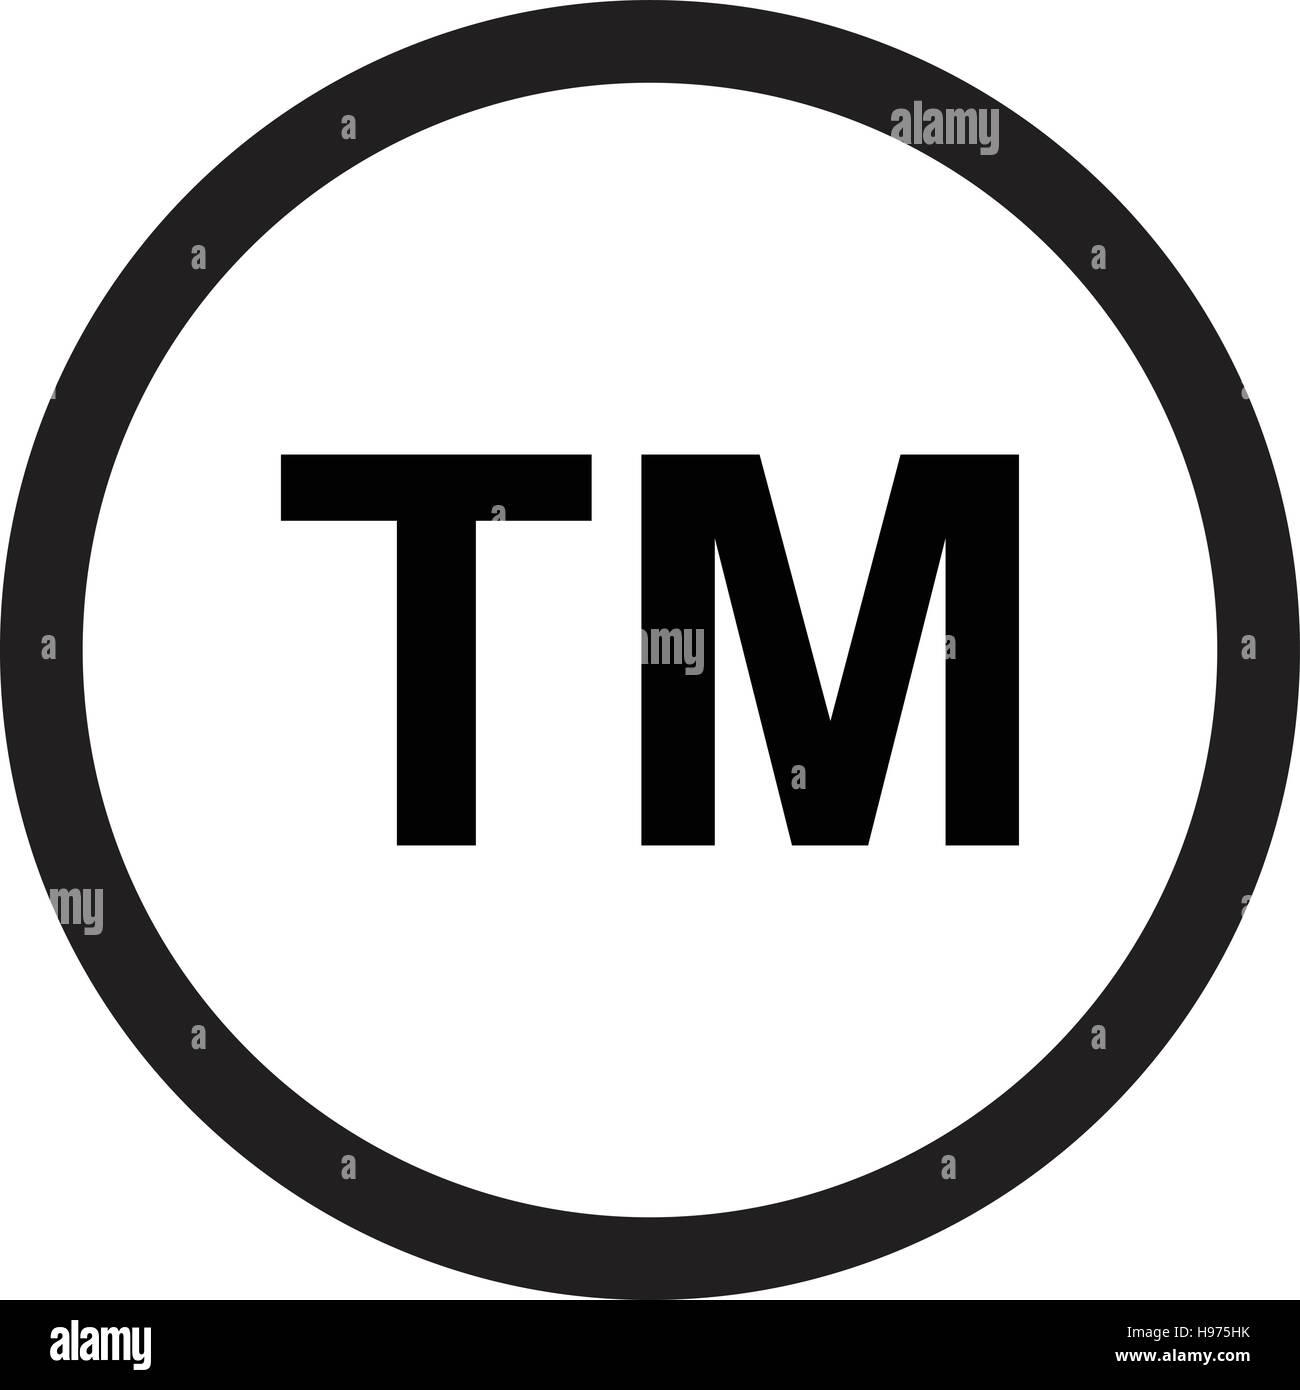 Trademark symbol icon stock vector art illustration vector trademark symbol icon buycottarizona Choice Image